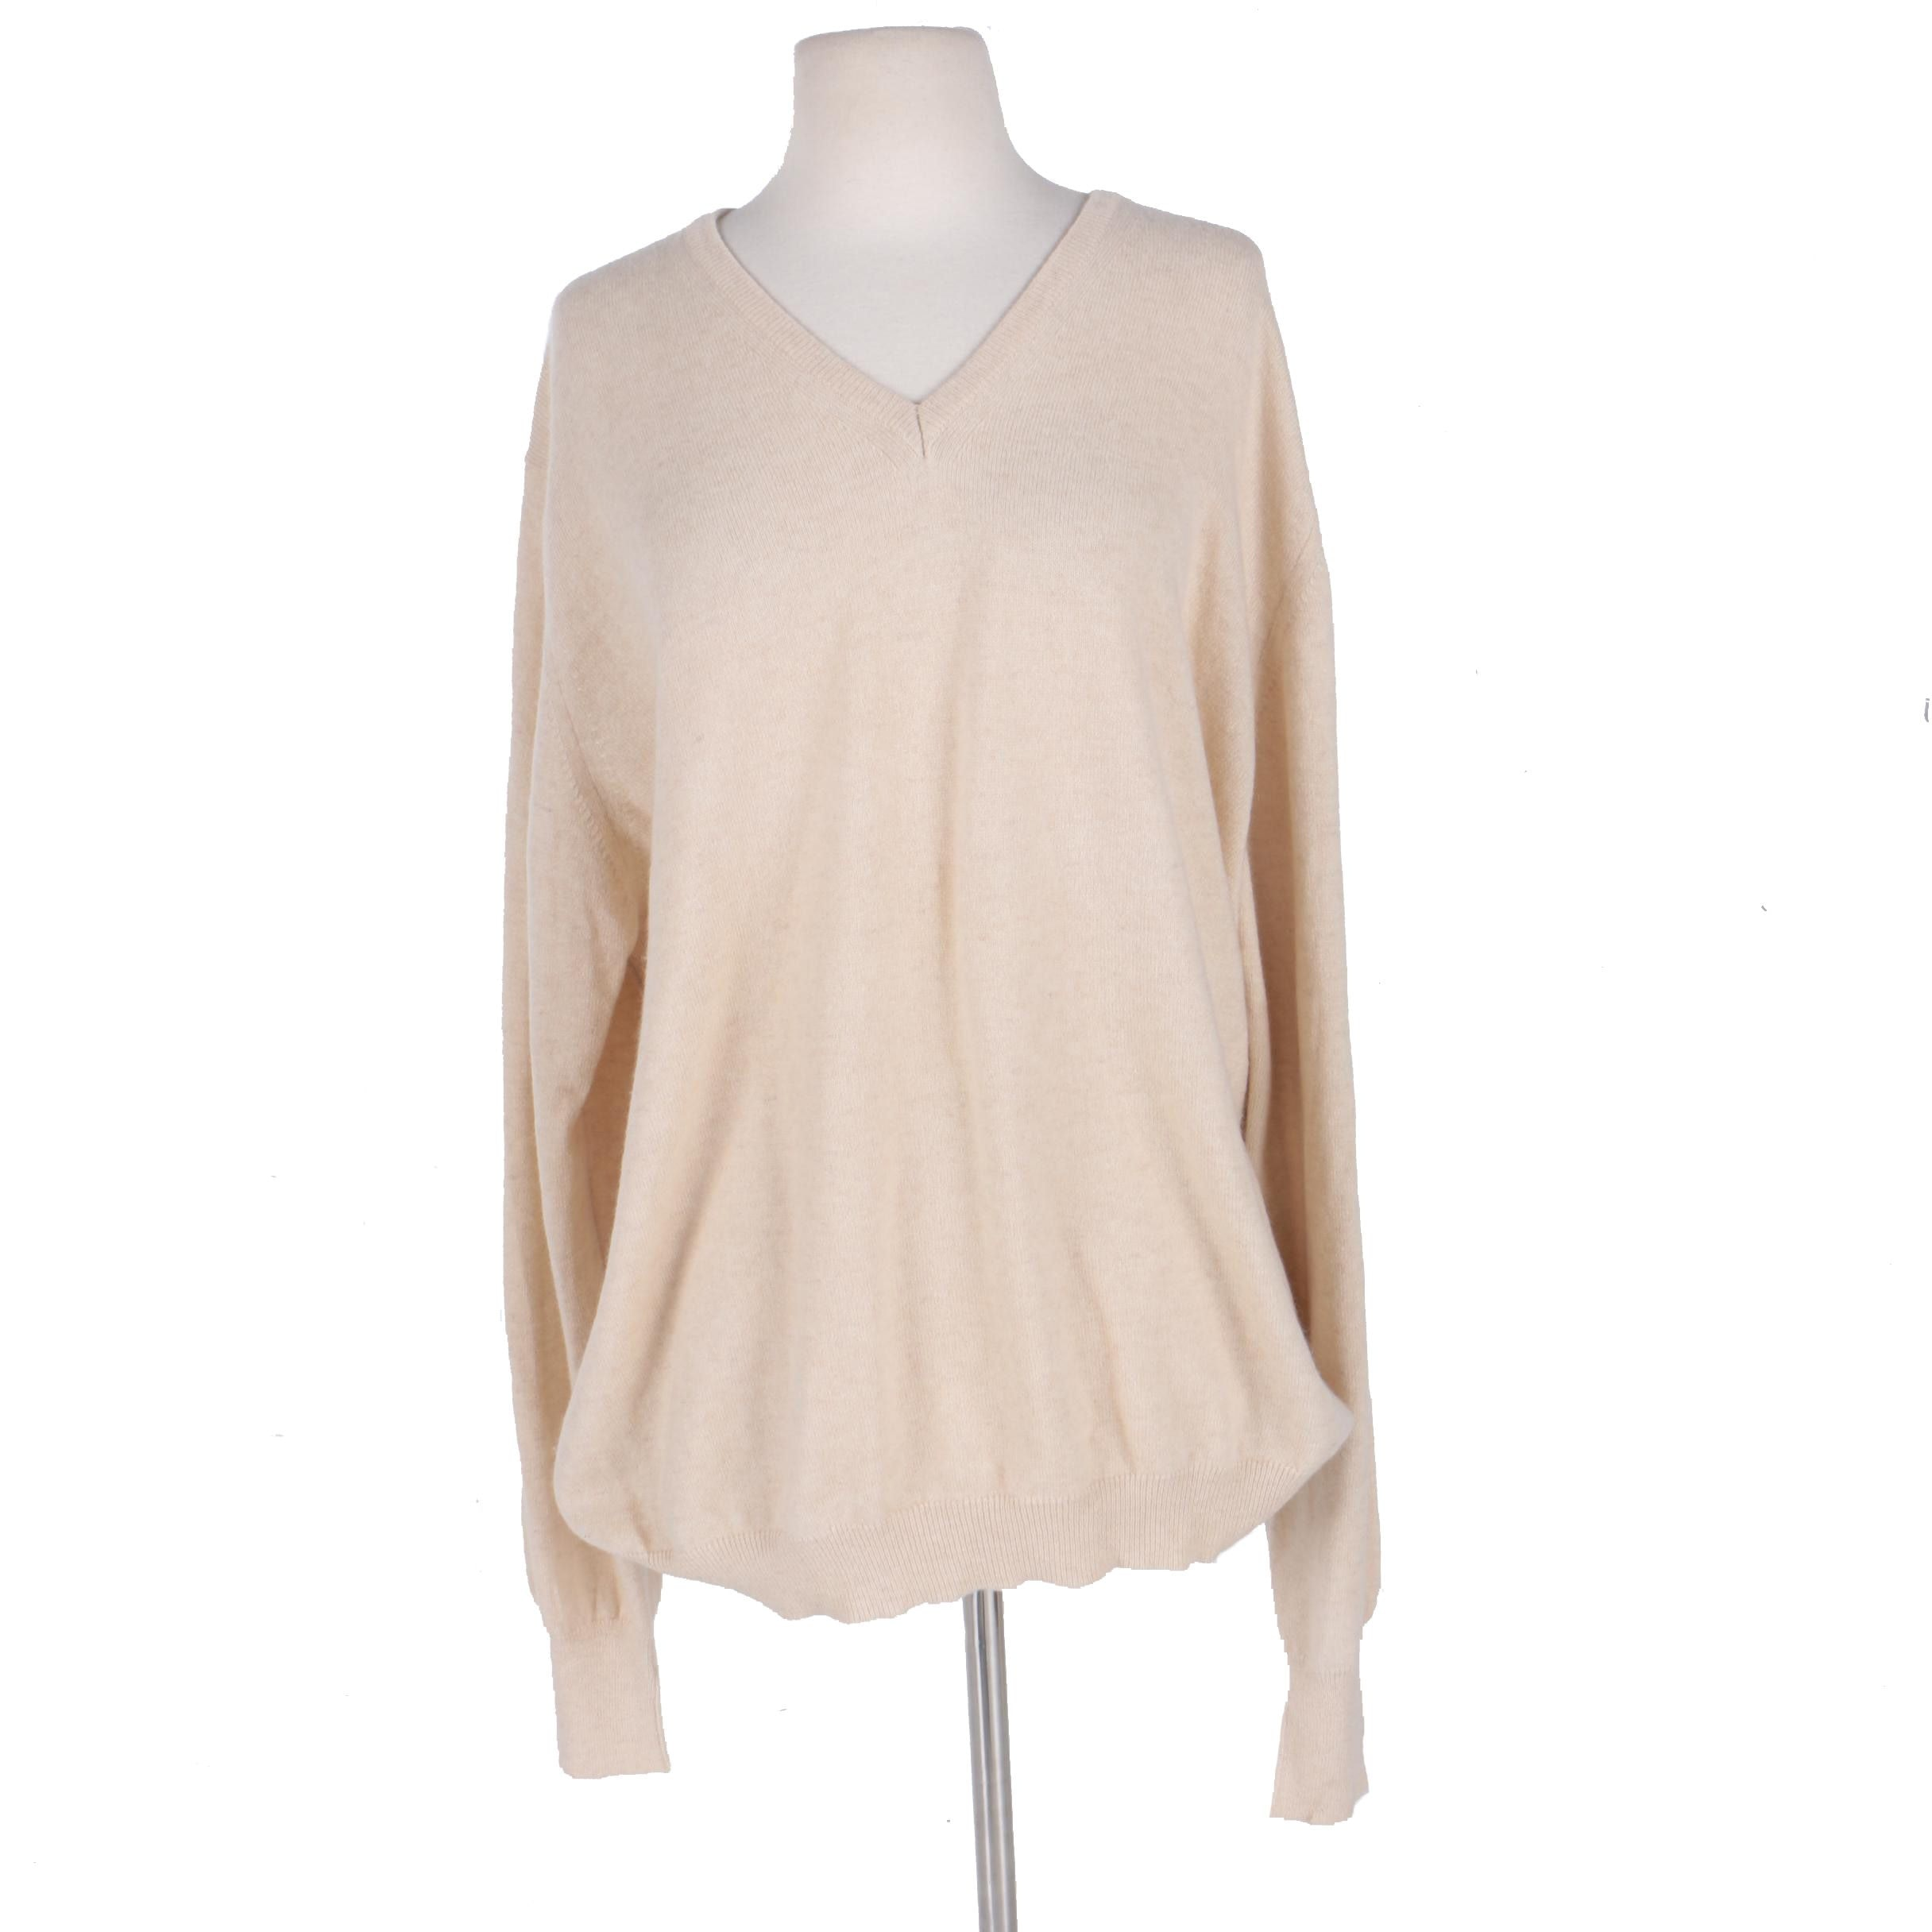 Men's Cashmere Burberry Sweater